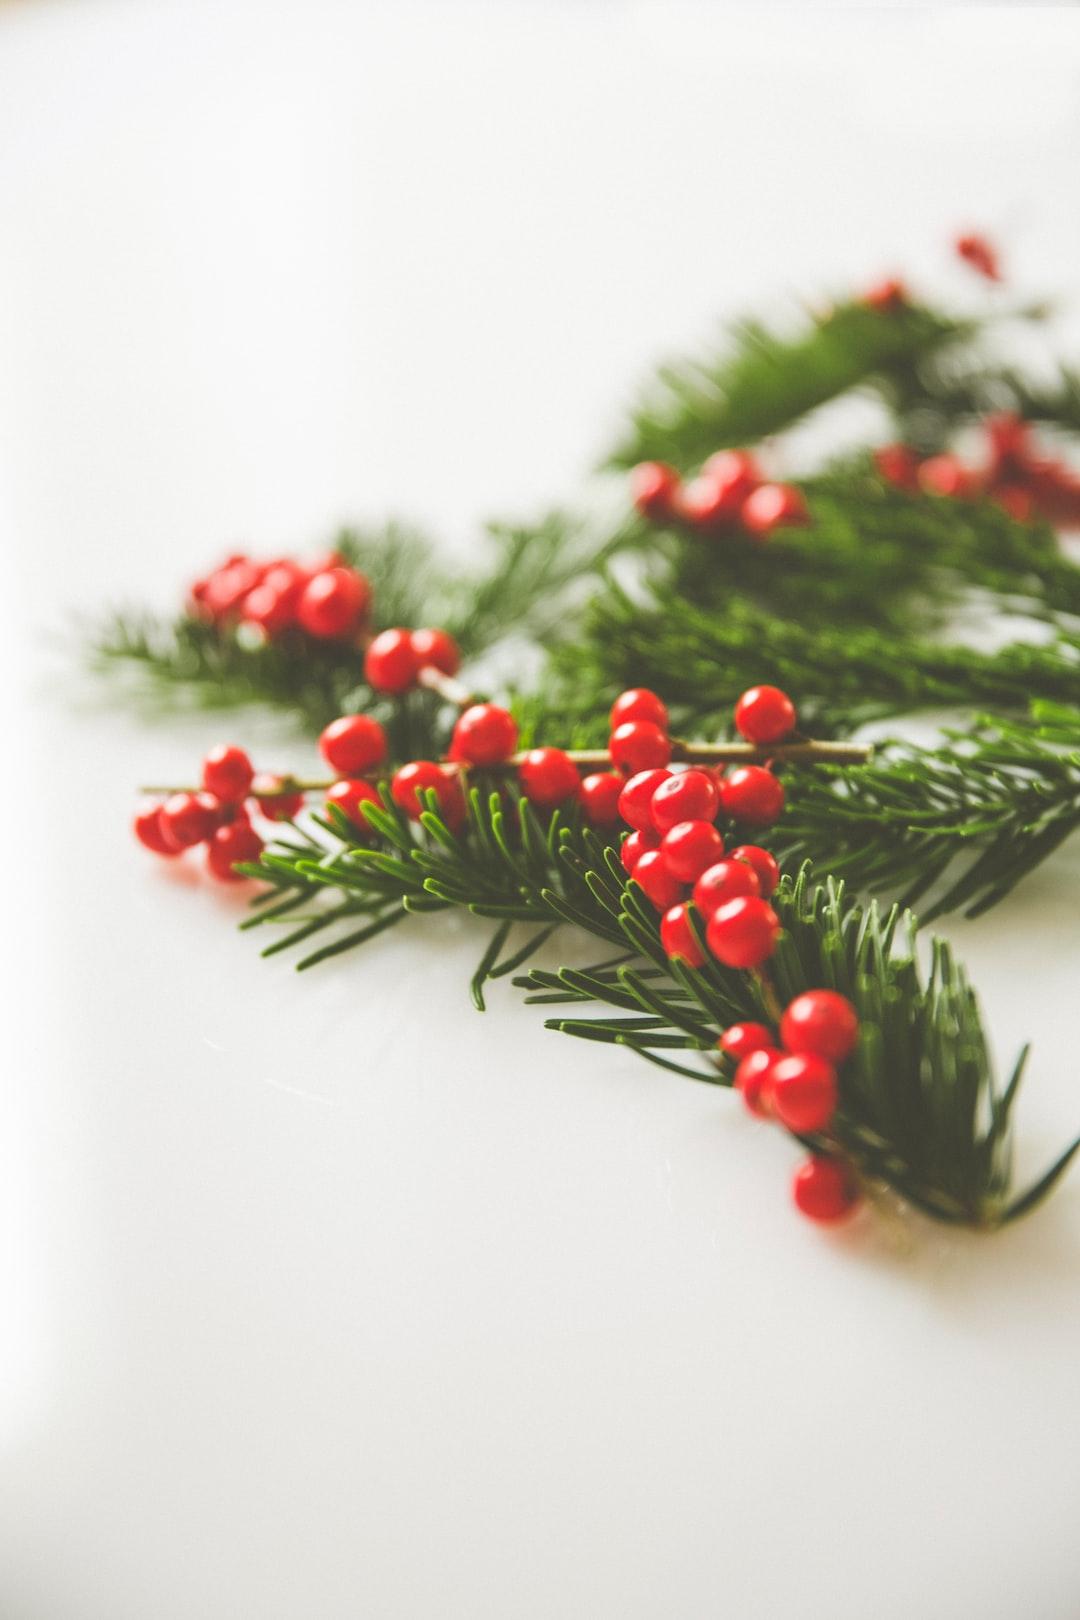 Christmas decoration fir branch with amercian holly Feuilles De Houx Et Baies